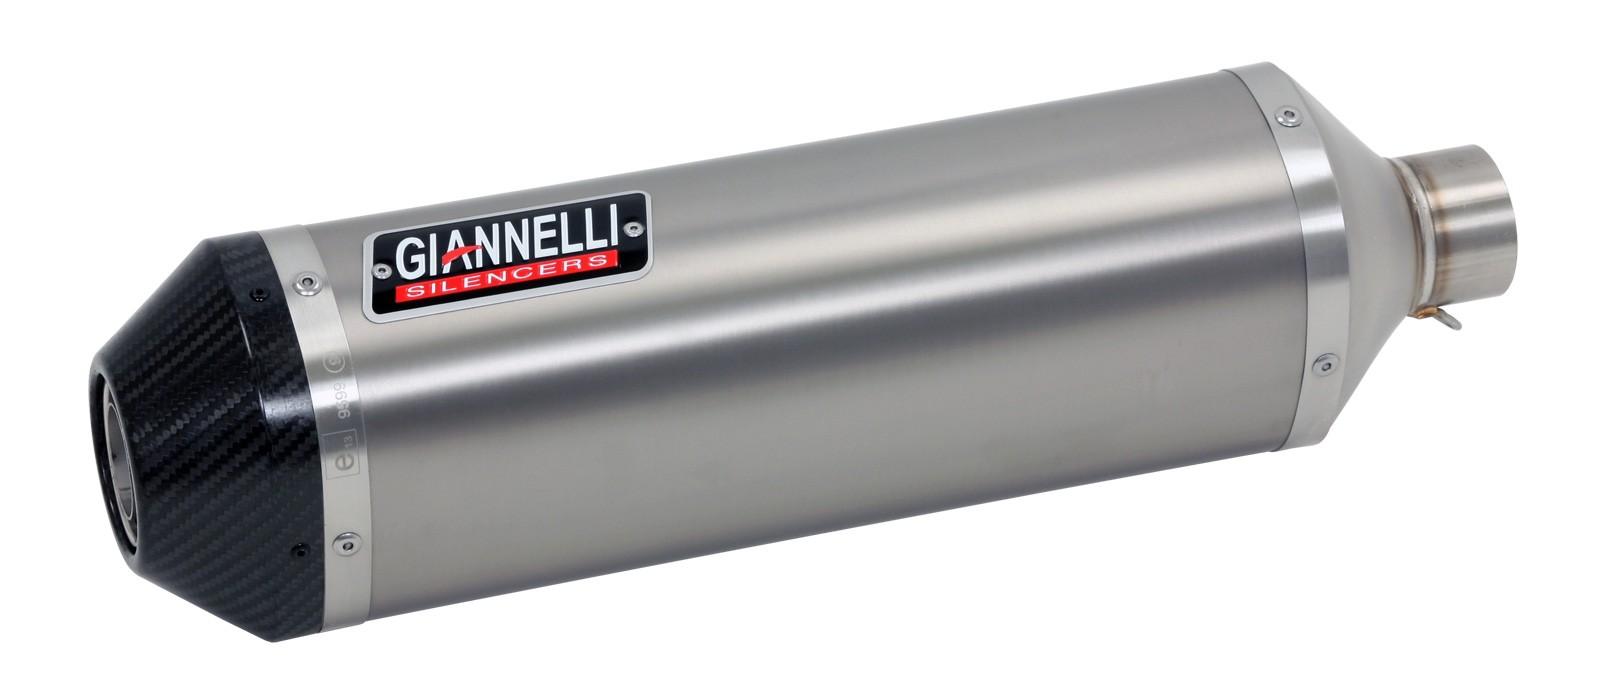 ESCAPES GIANNELLI KAWASAKI - Sistema completo IPERSPORT Silenciador aluminio Kawasaki Z 1000 Giannelli 73813A6K -